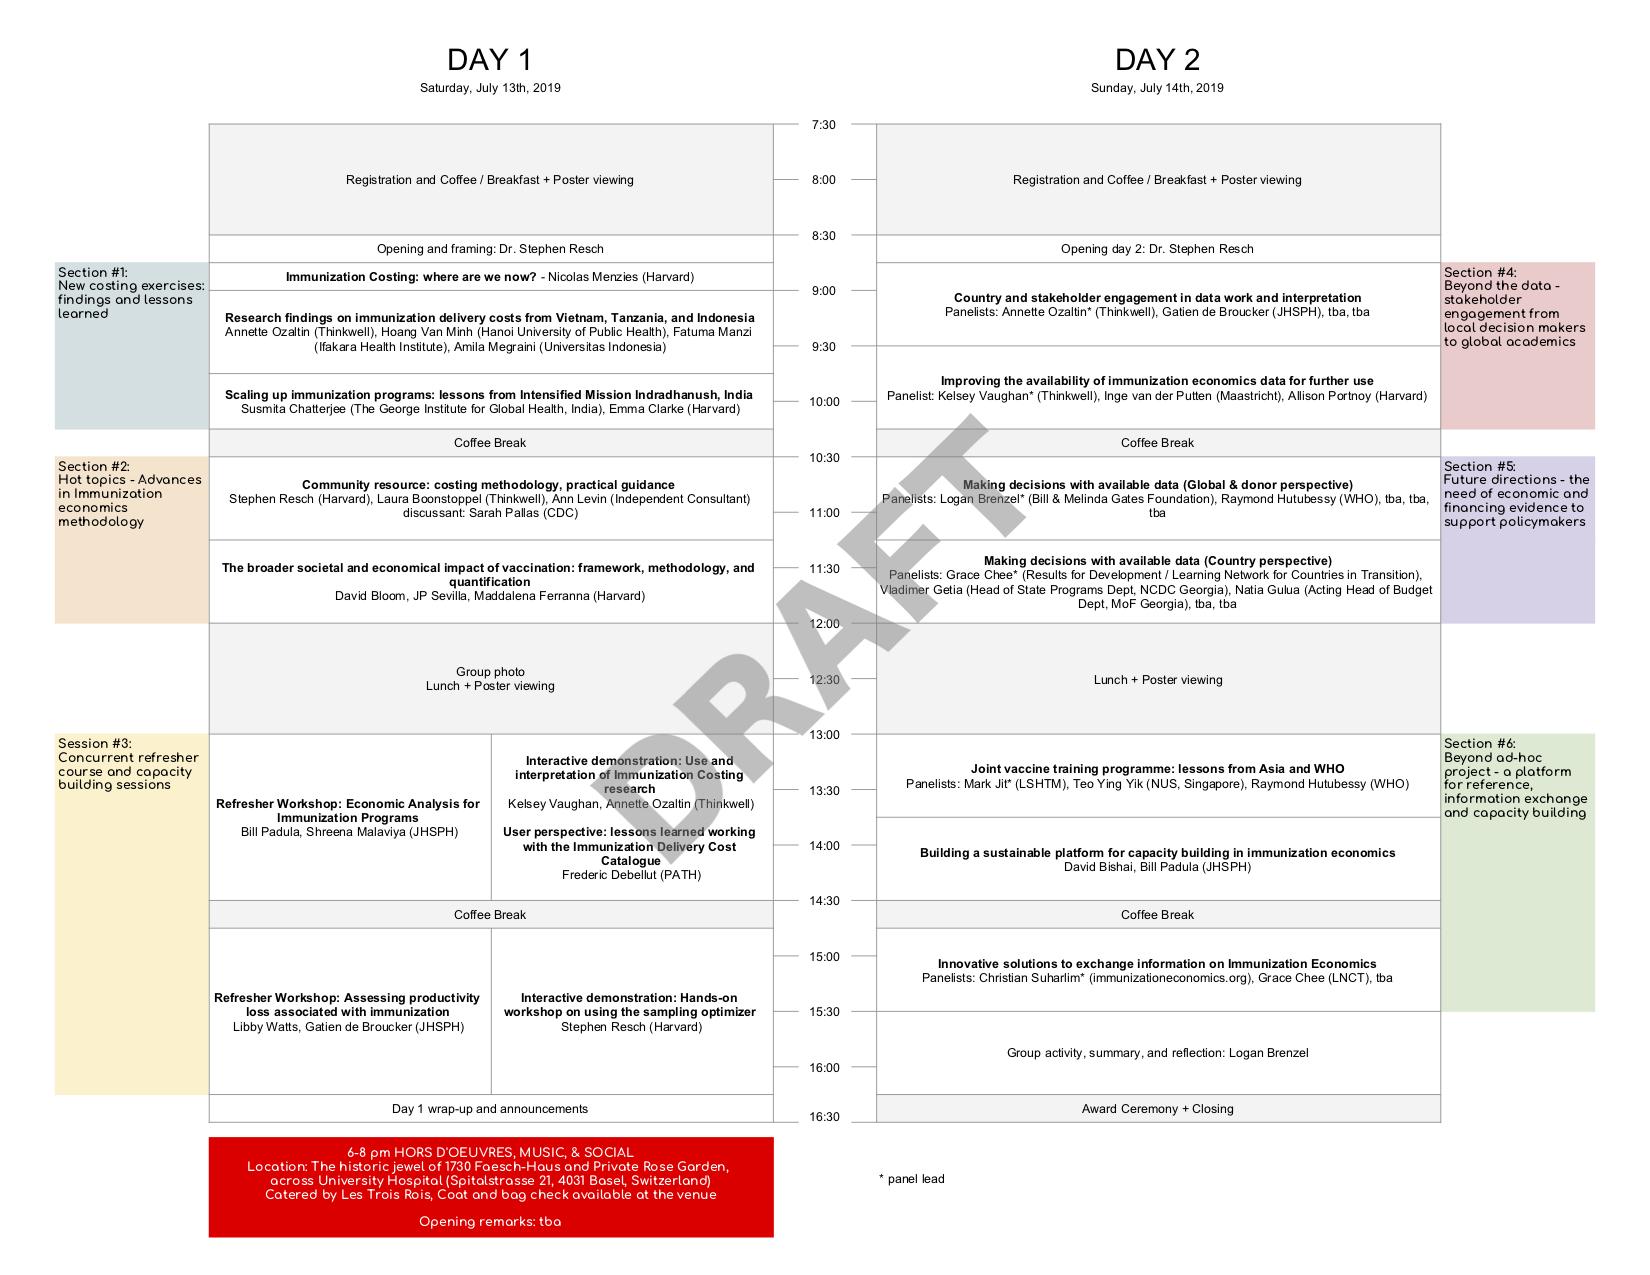 iHEA Basel pre-Congress, Immunization Economics - updated session agenda-9.jpg